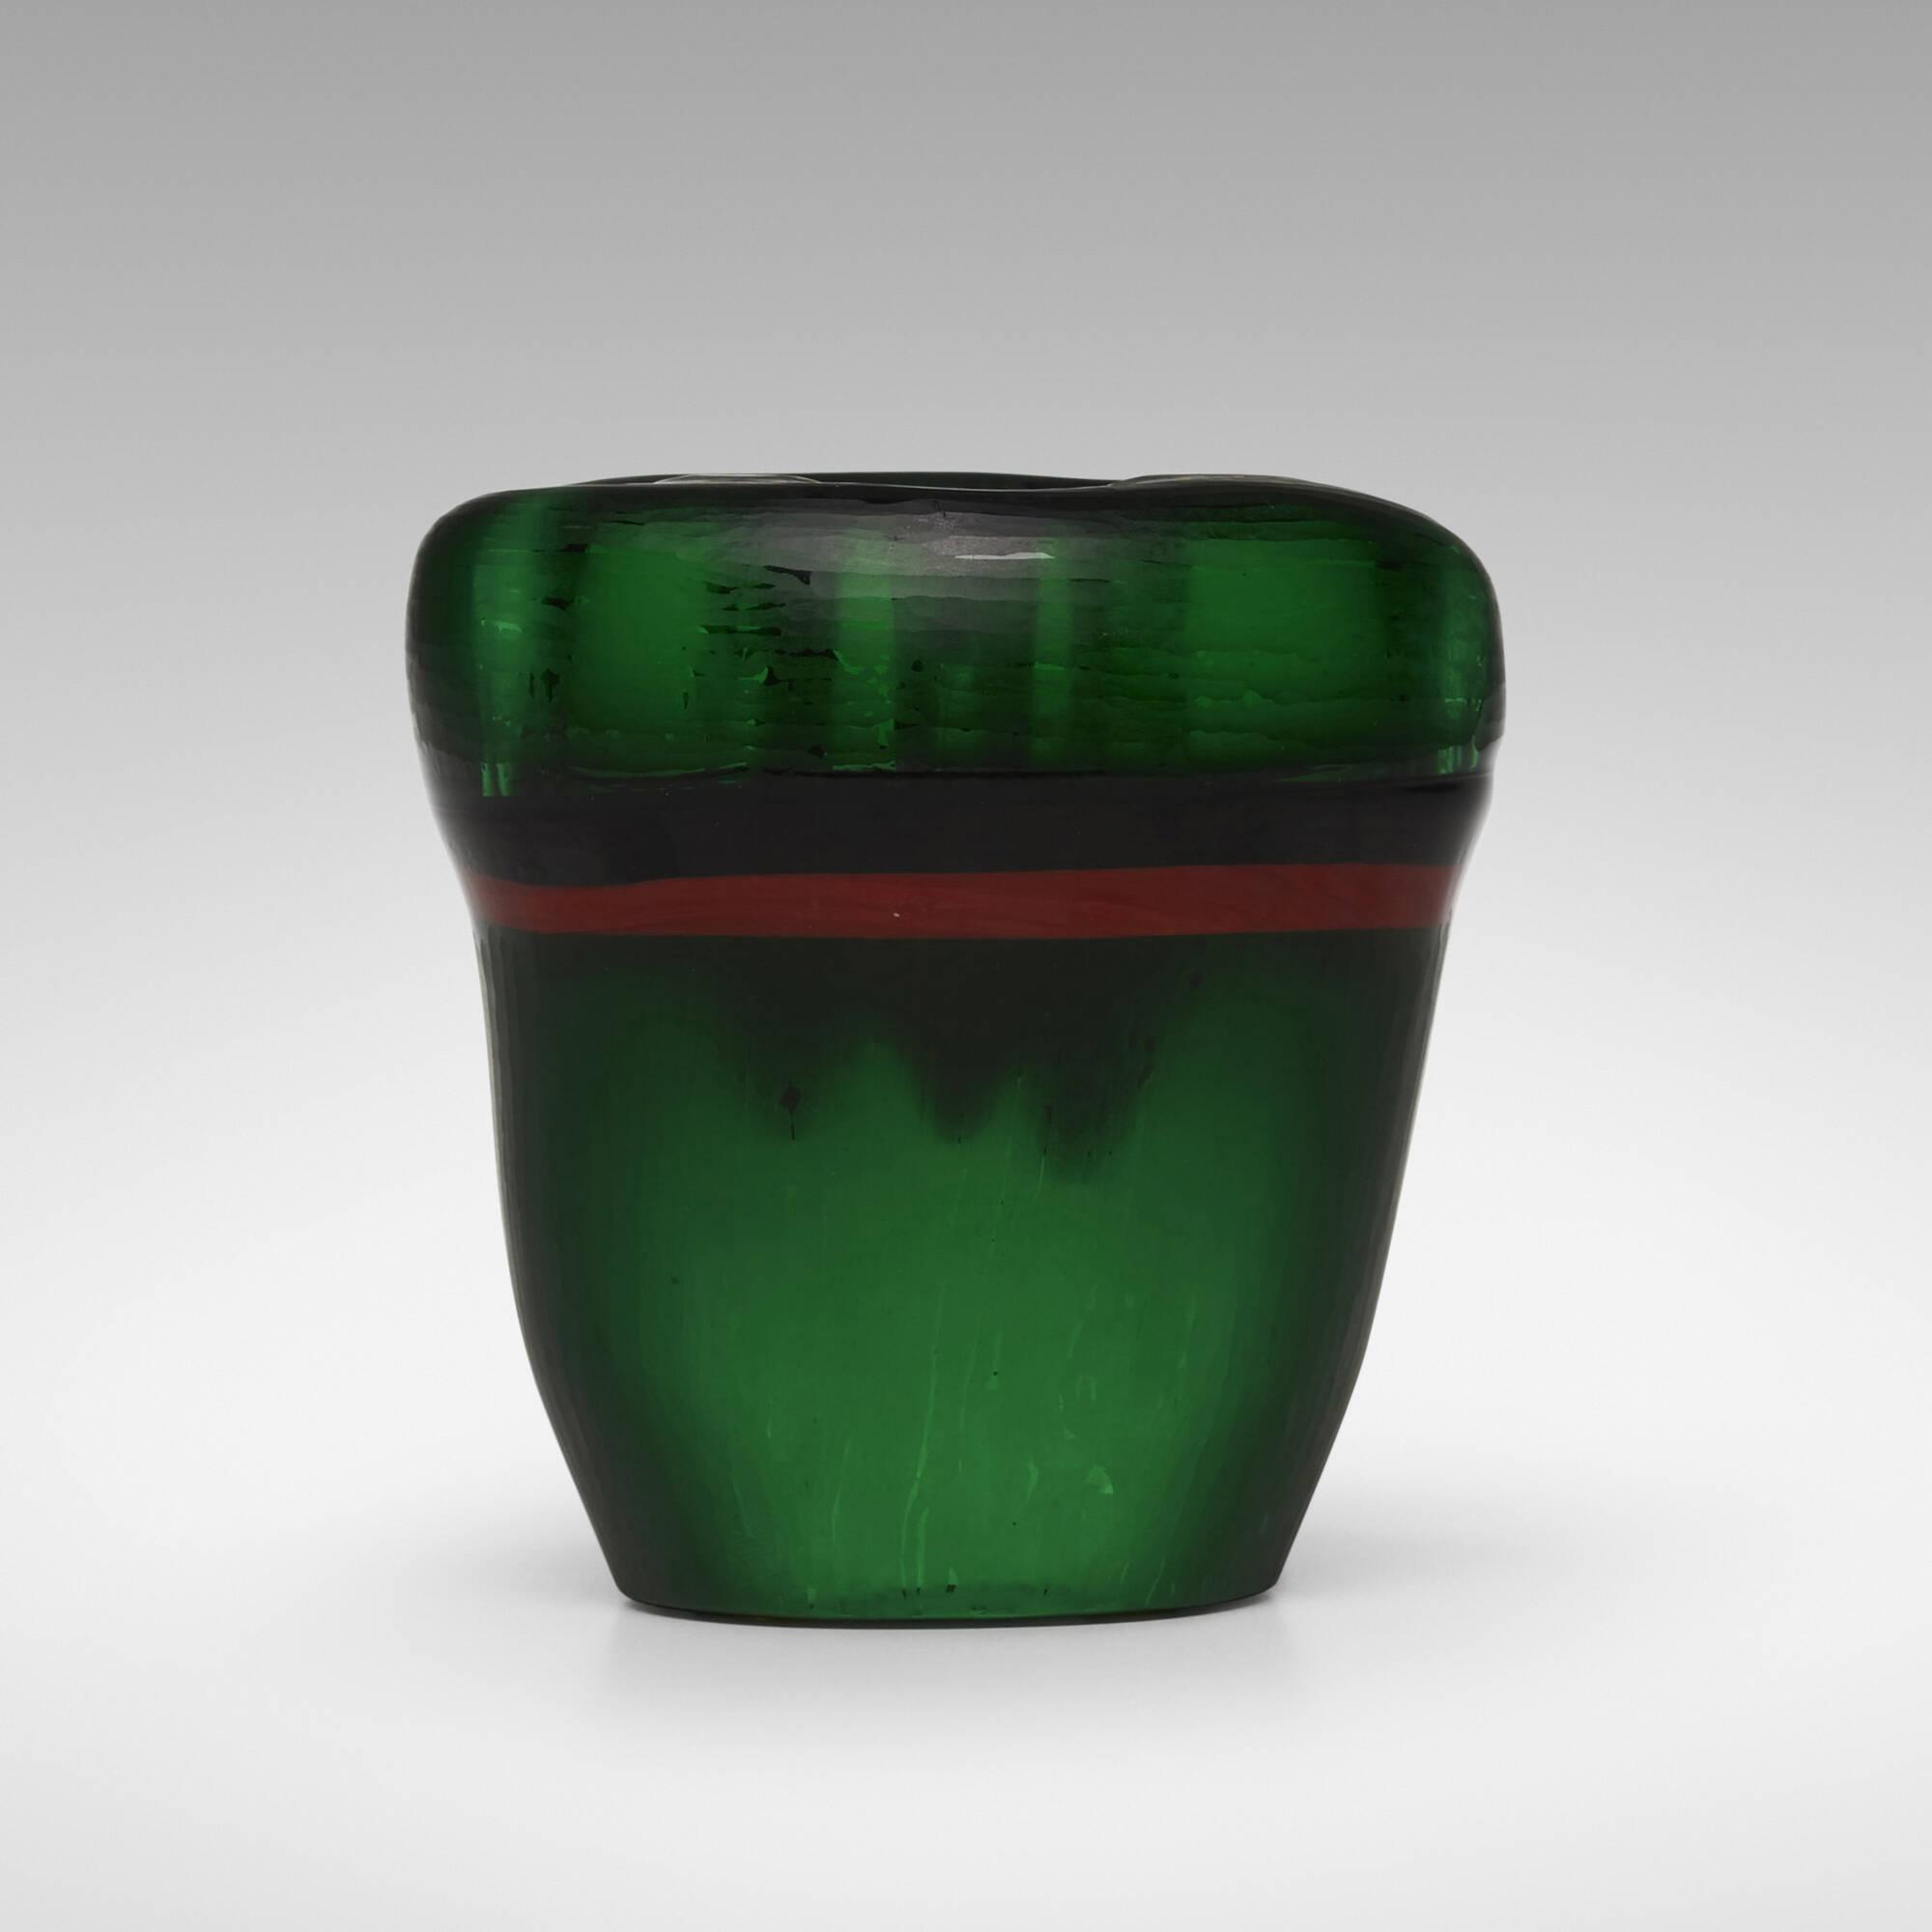 149: Fulvio Bianconi / Sasso vase (2 of 3)